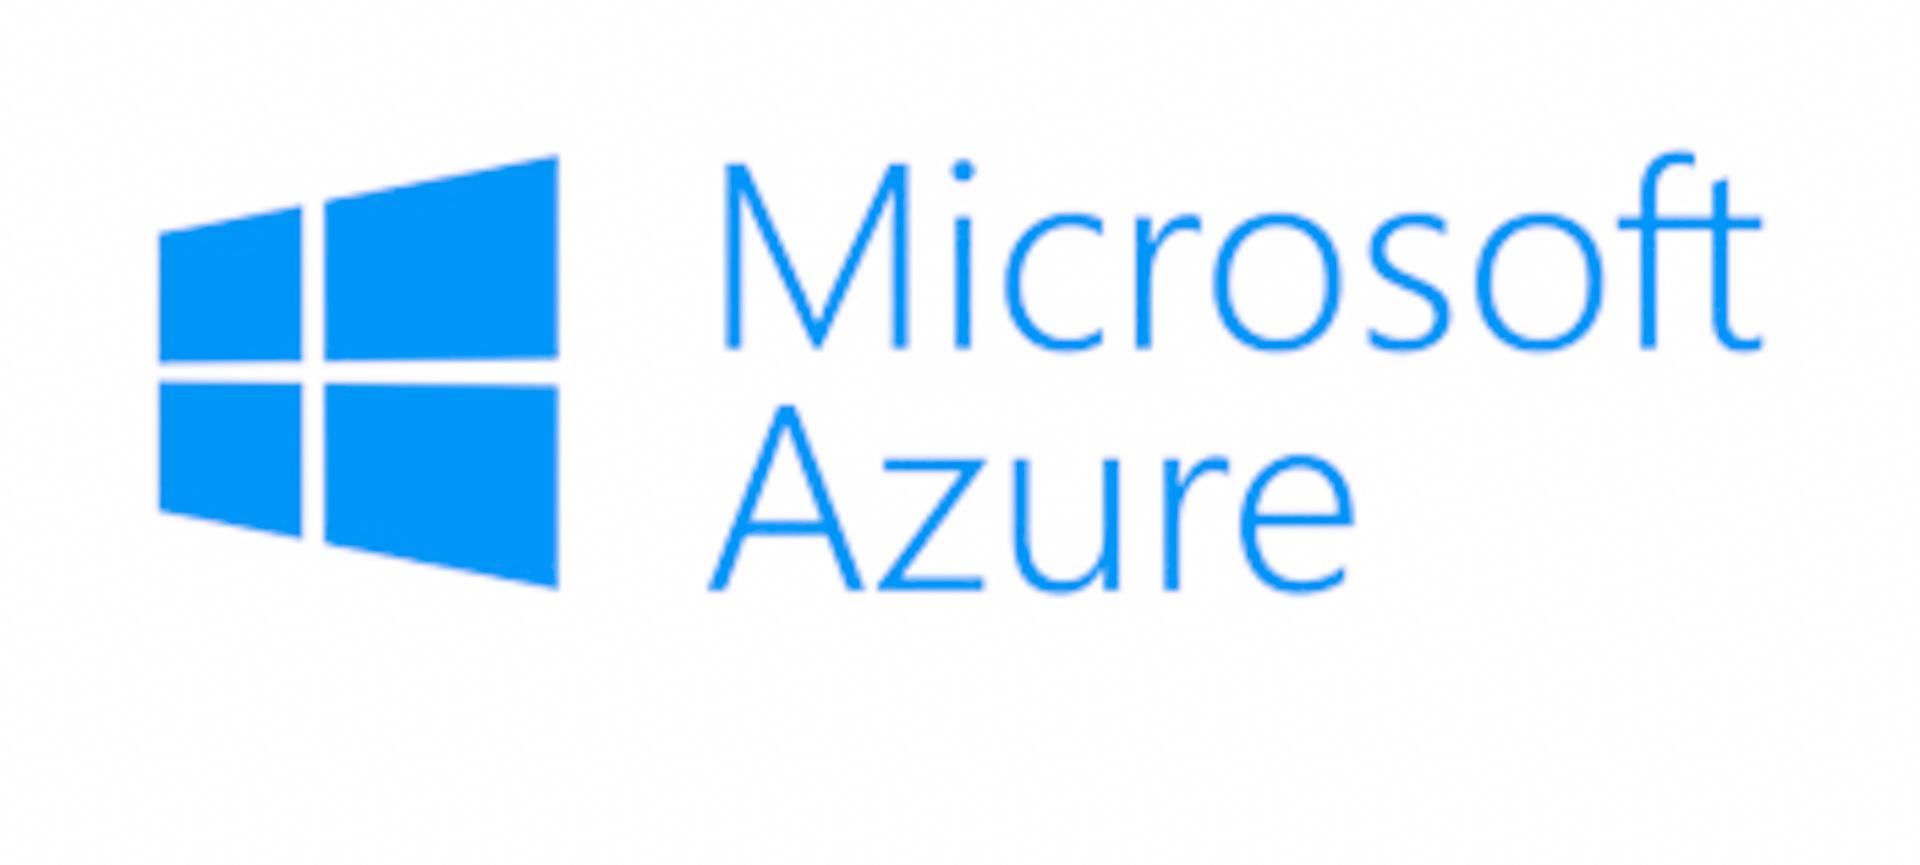 4 Main Benfits of using Microsoft Azure